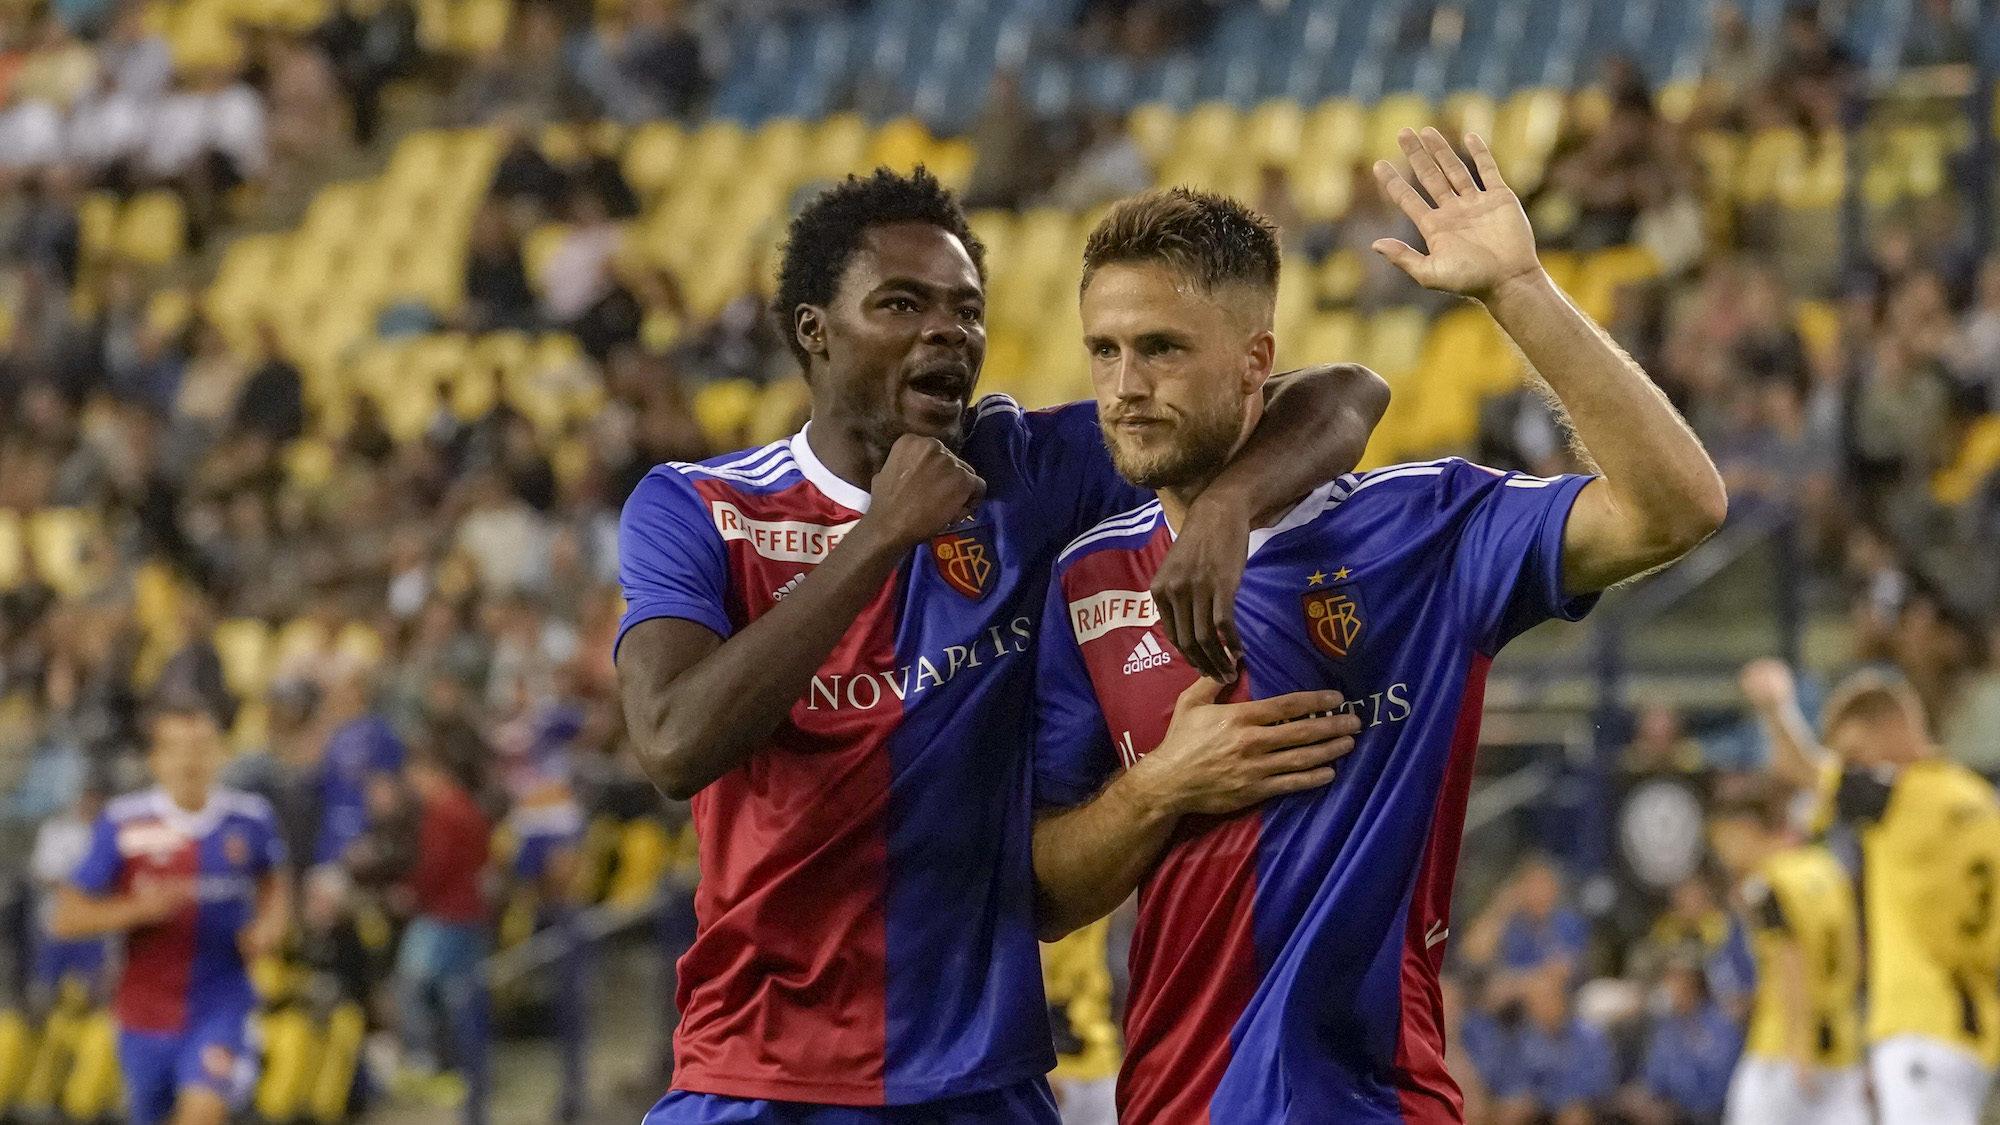 09.08.2018; Arnheim; FUSSBALL EUROPA LEAGUE QUALI  - Vitesse Arnheim - FC Basel;Dimitri Oberlin (Basel) Ricky van Wolfswinke